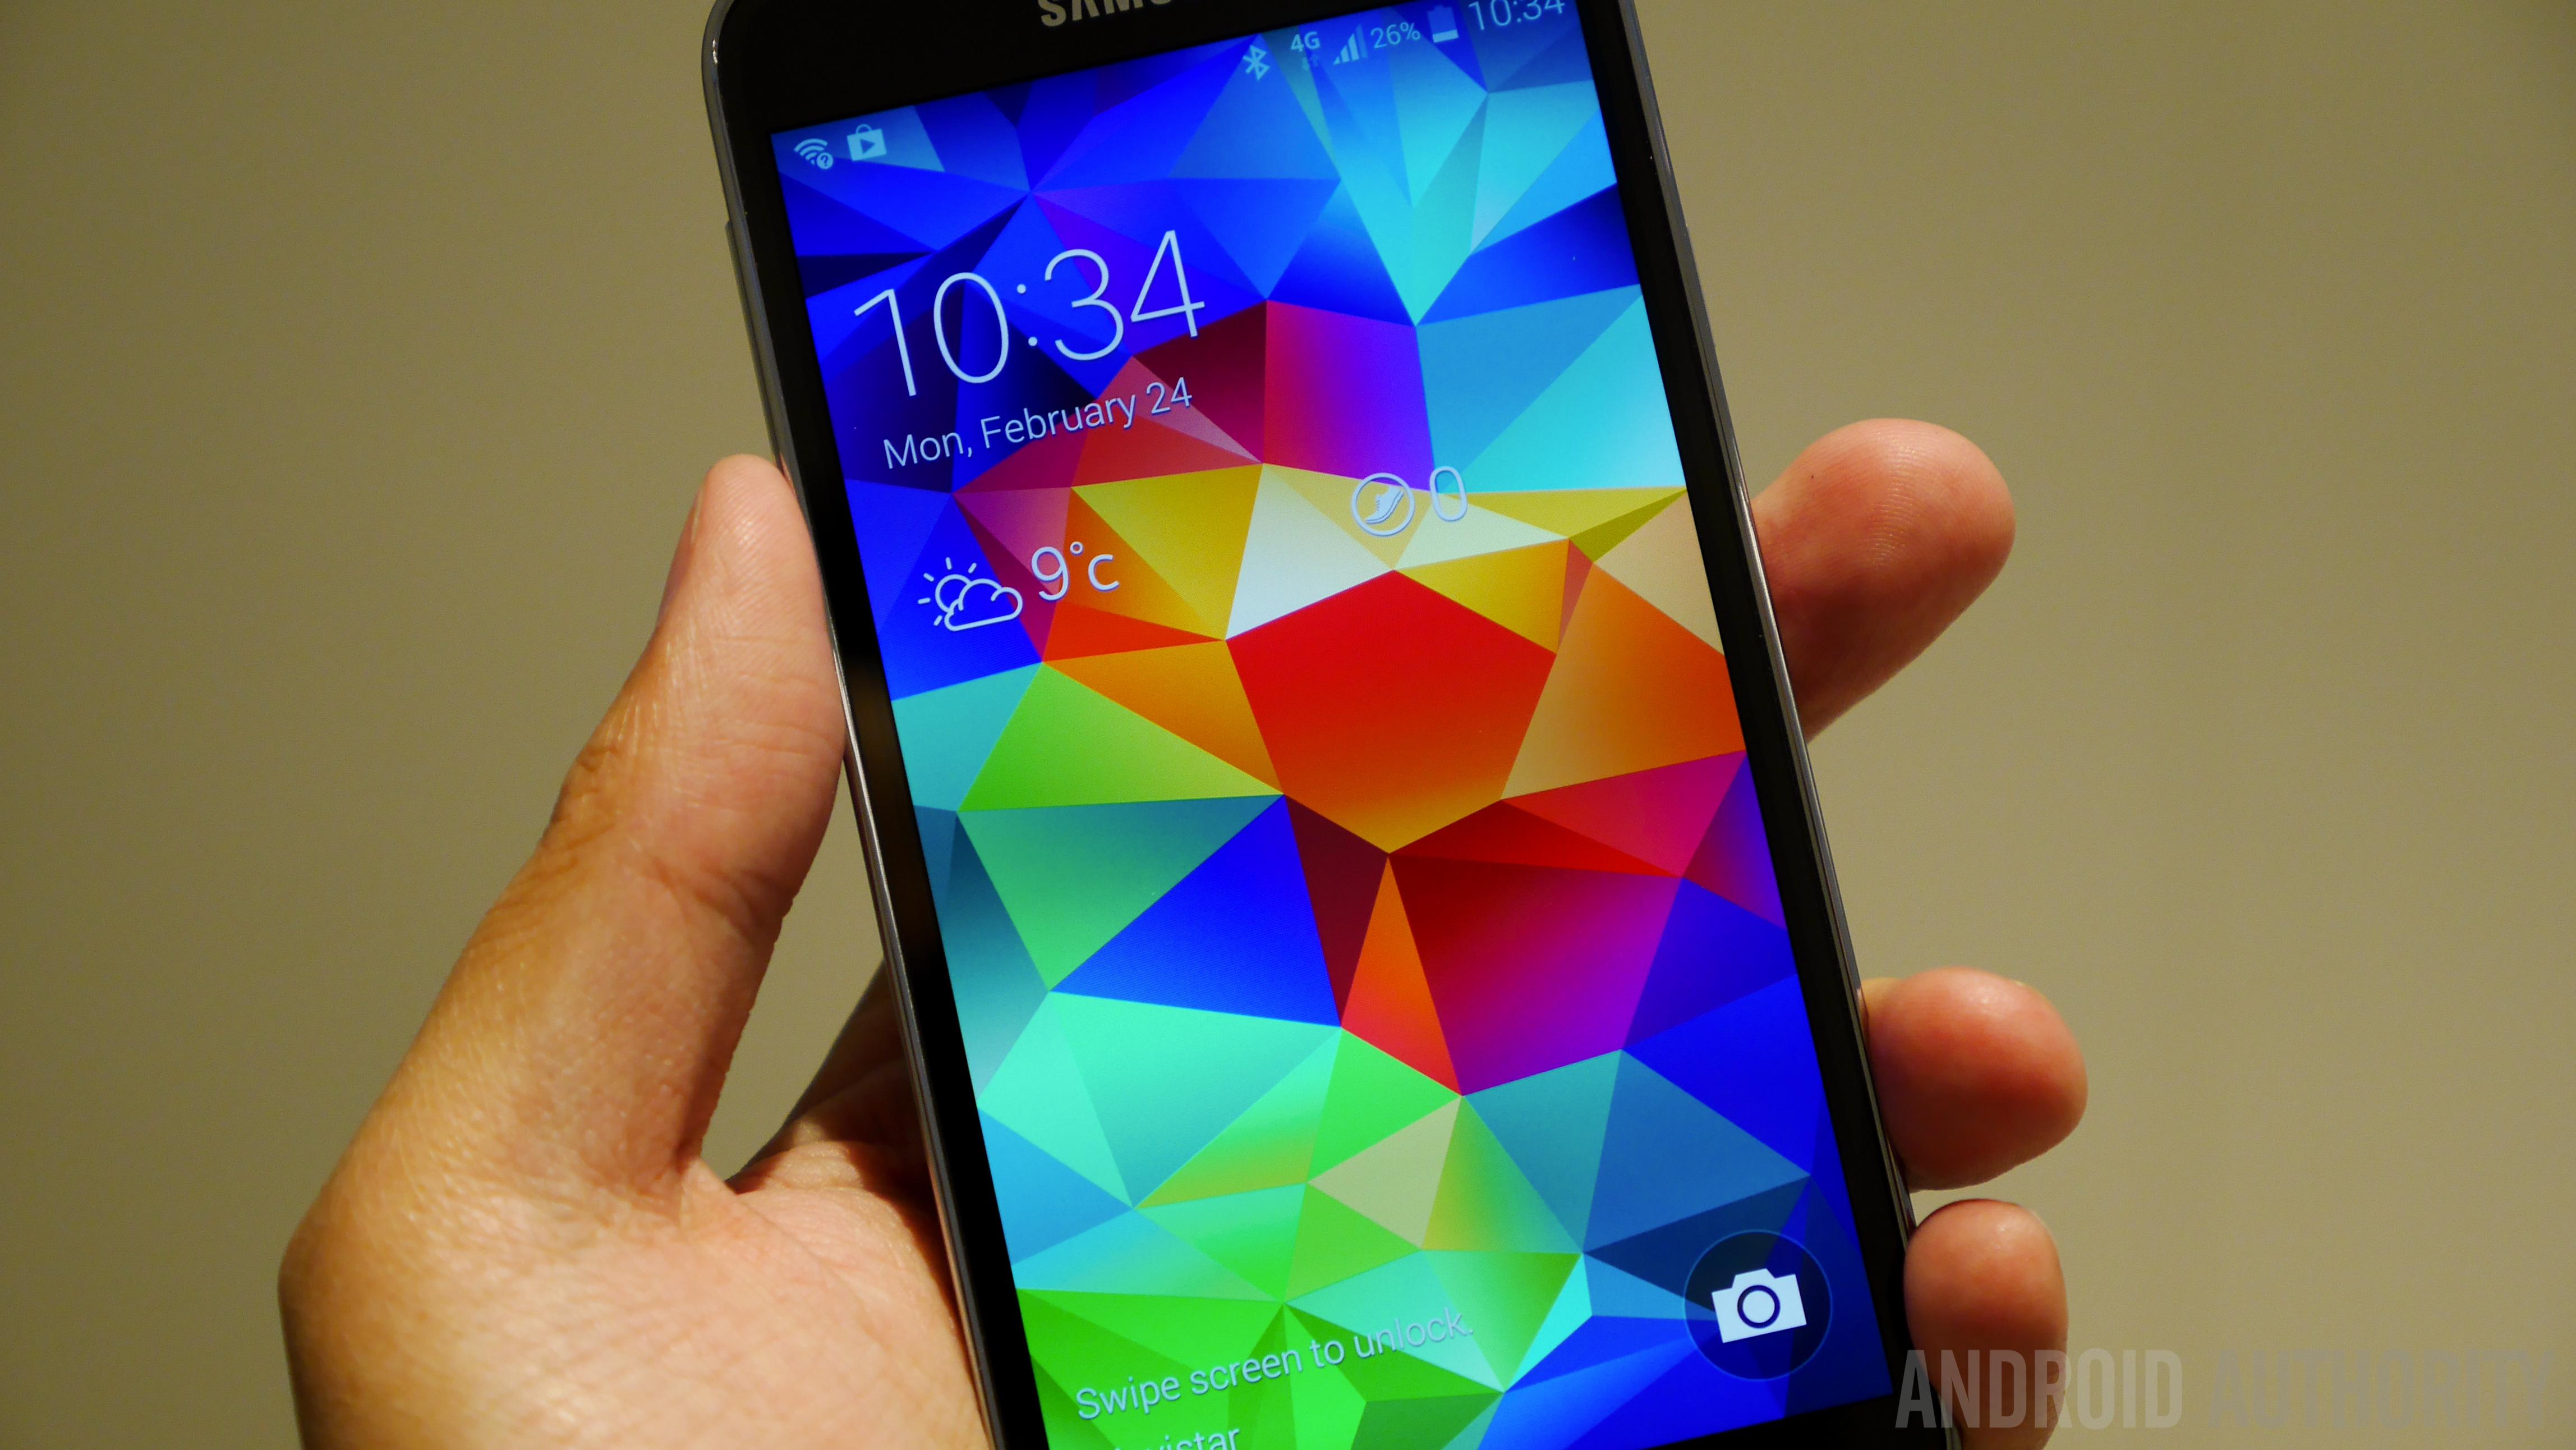 Samsung Galaxy S5 Hands on MWC 2014-1160010